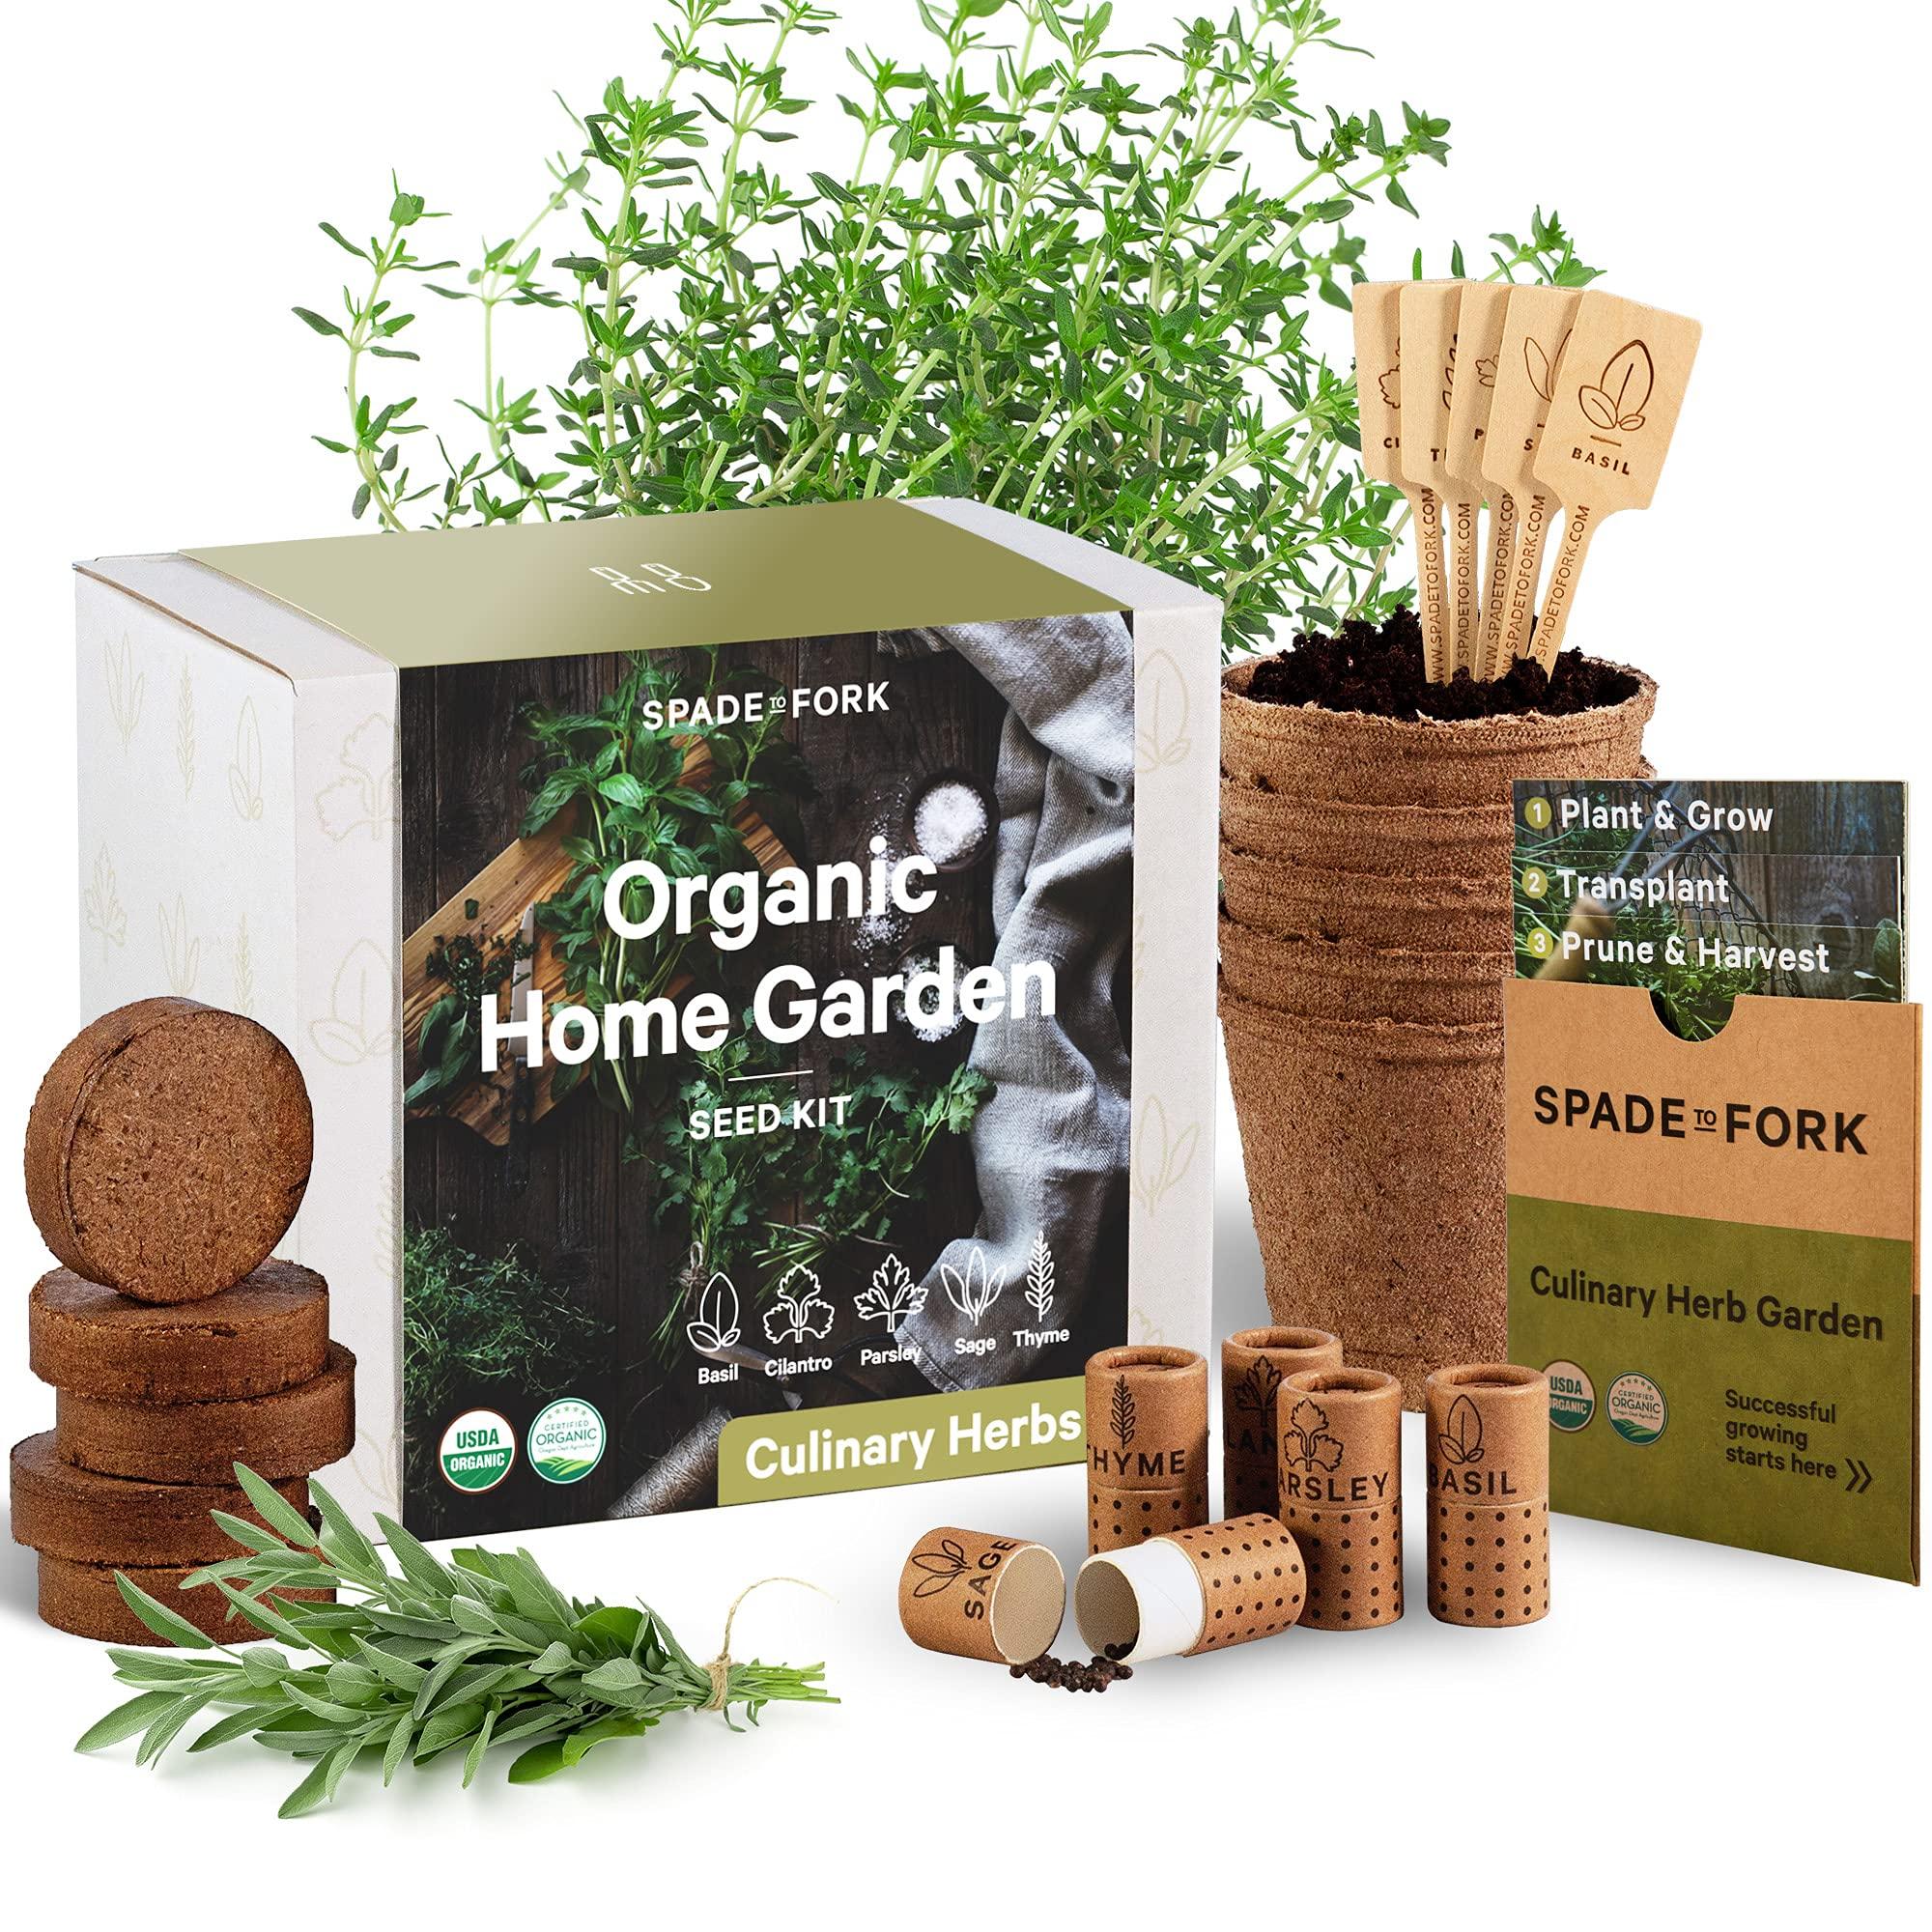 Indoor Herb Garden Starter Kit - Certified USDA Organic Non GMO - 5 Herb Seed Basil, Cilantro, Parsley, Sage, Thyme, Potting Soil, Peat Pots - DIY Kitchen Grow Kit for Growing Herb Seeds Indoors